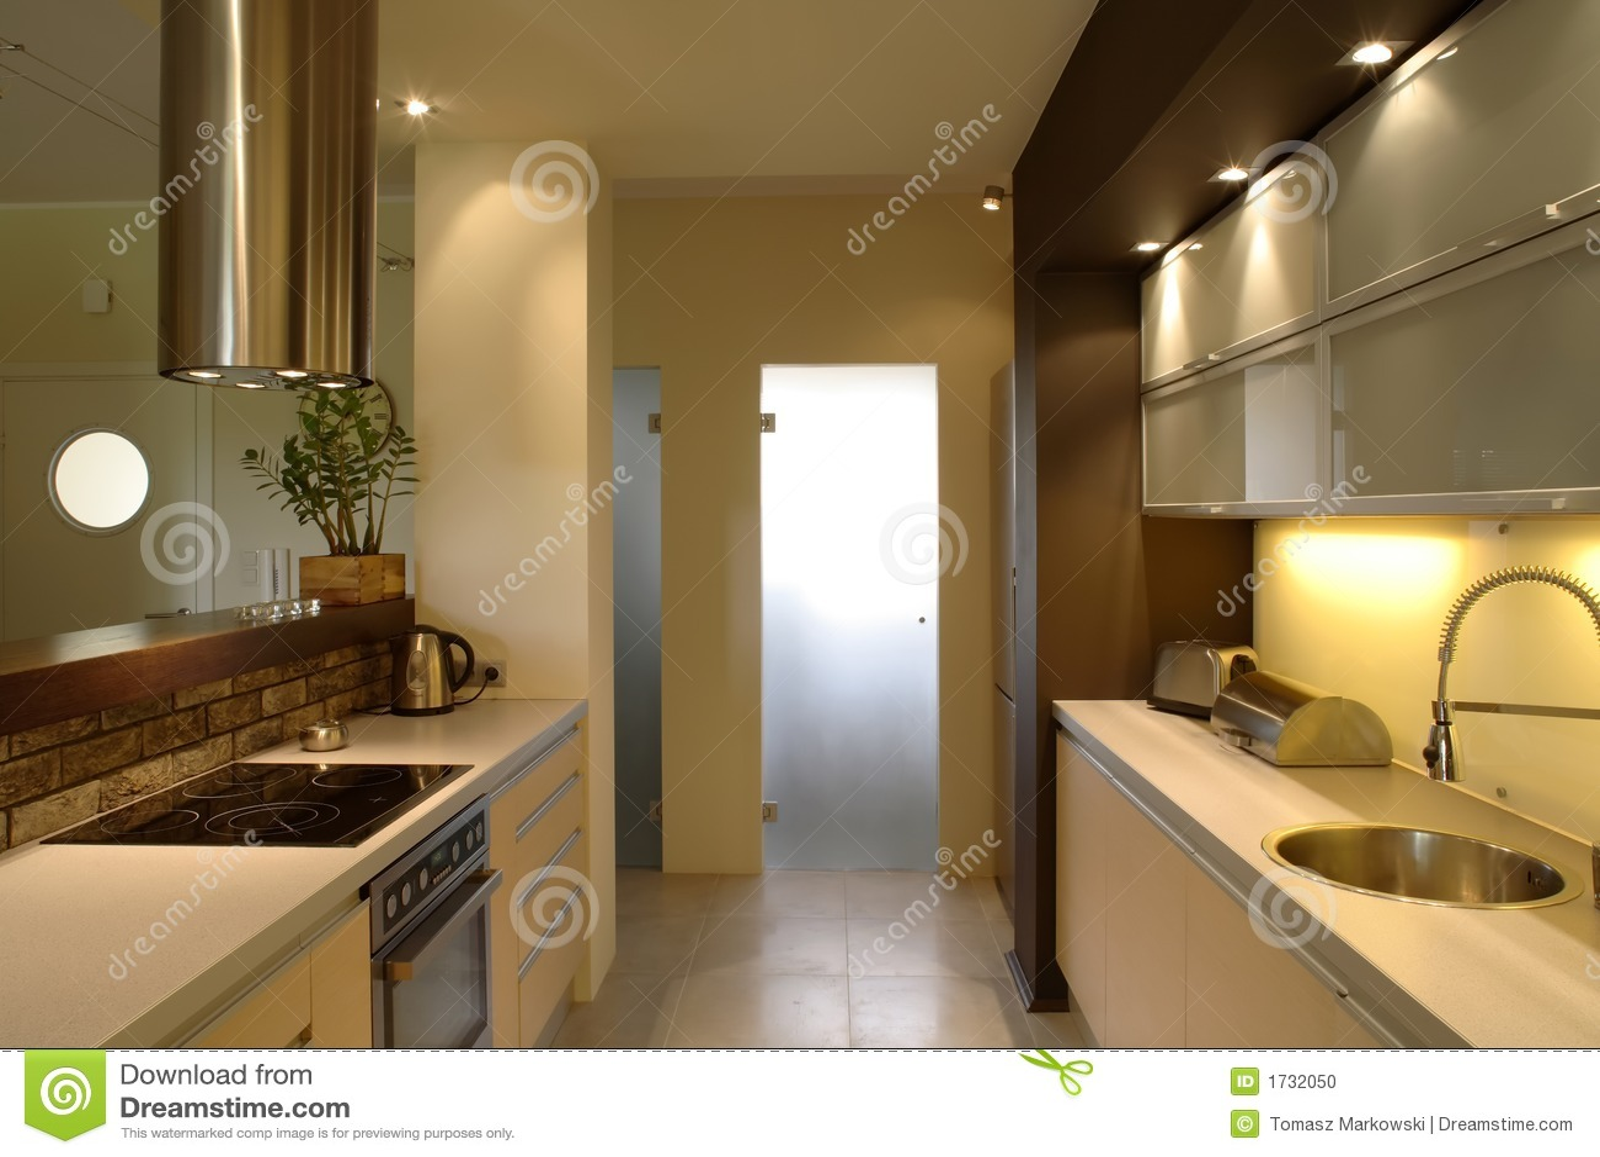 cuisine moderne d 39 appartement photo stock image du divertissement bakes 1732050. Black Bedroom Furniture Sets. Home Design Ideas